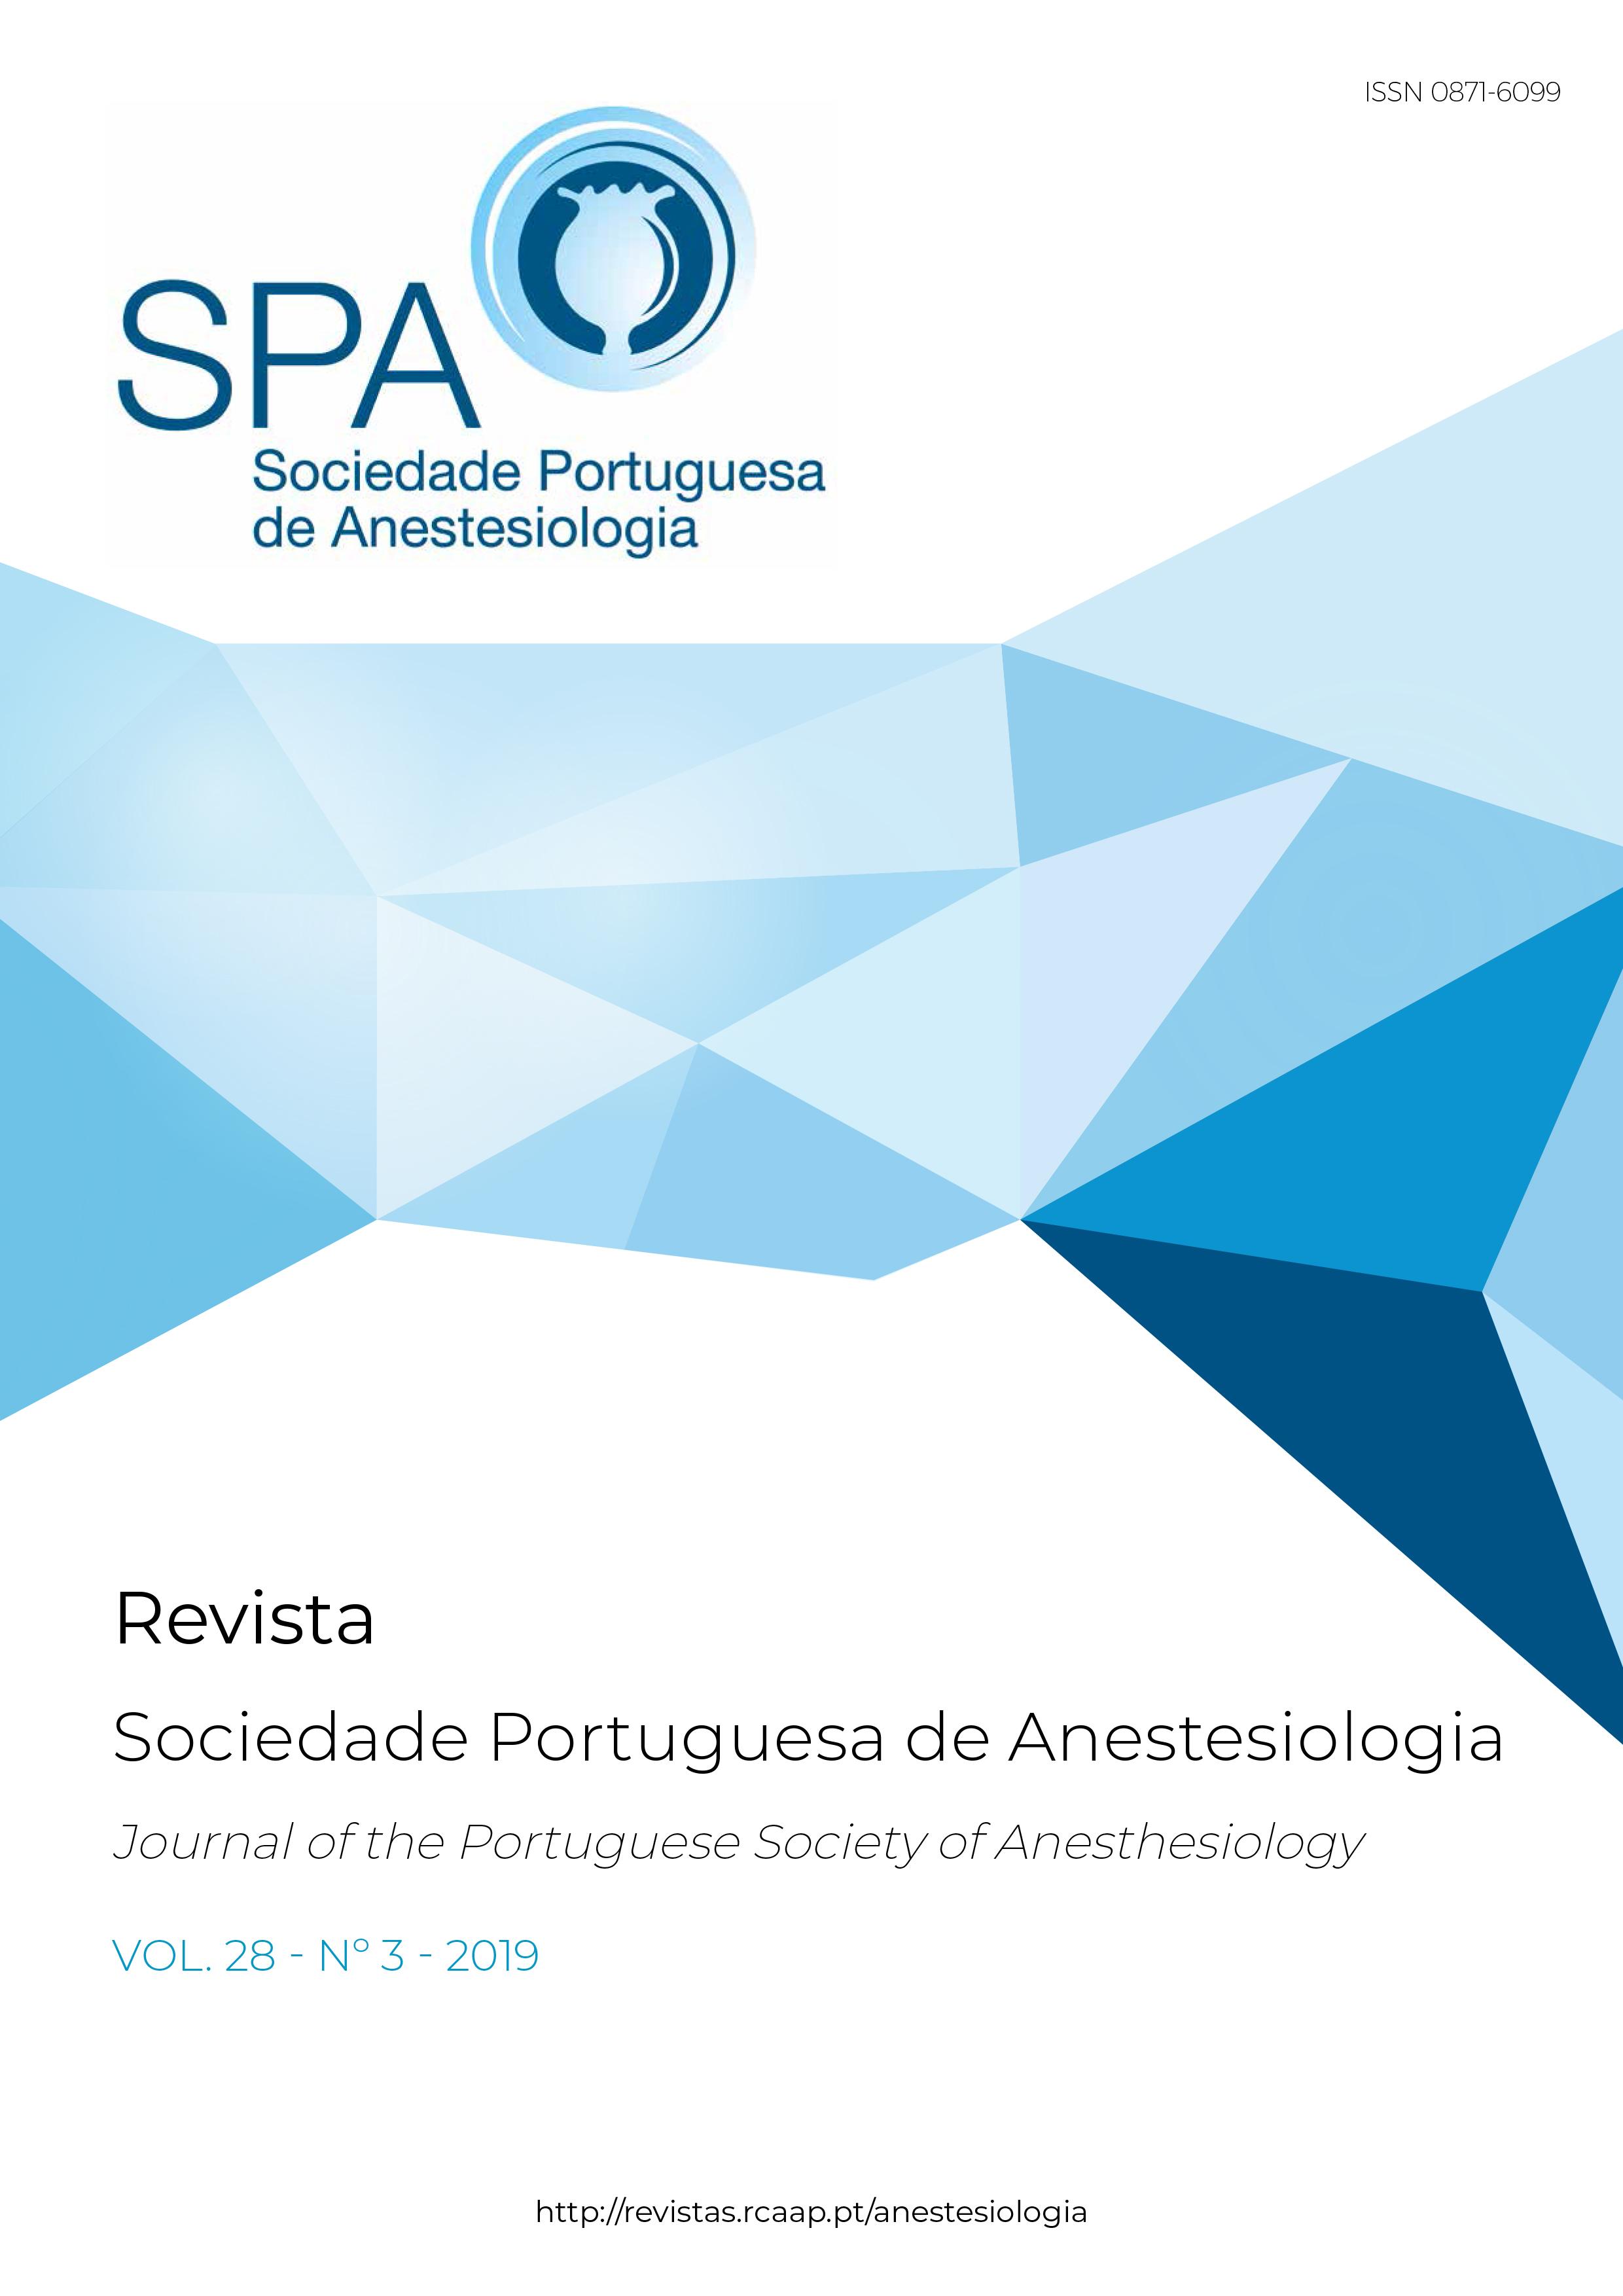 Ver Vol. 28 N.º 3 (2019): Revista da Sociedade Portuguesa de Anestesiologia